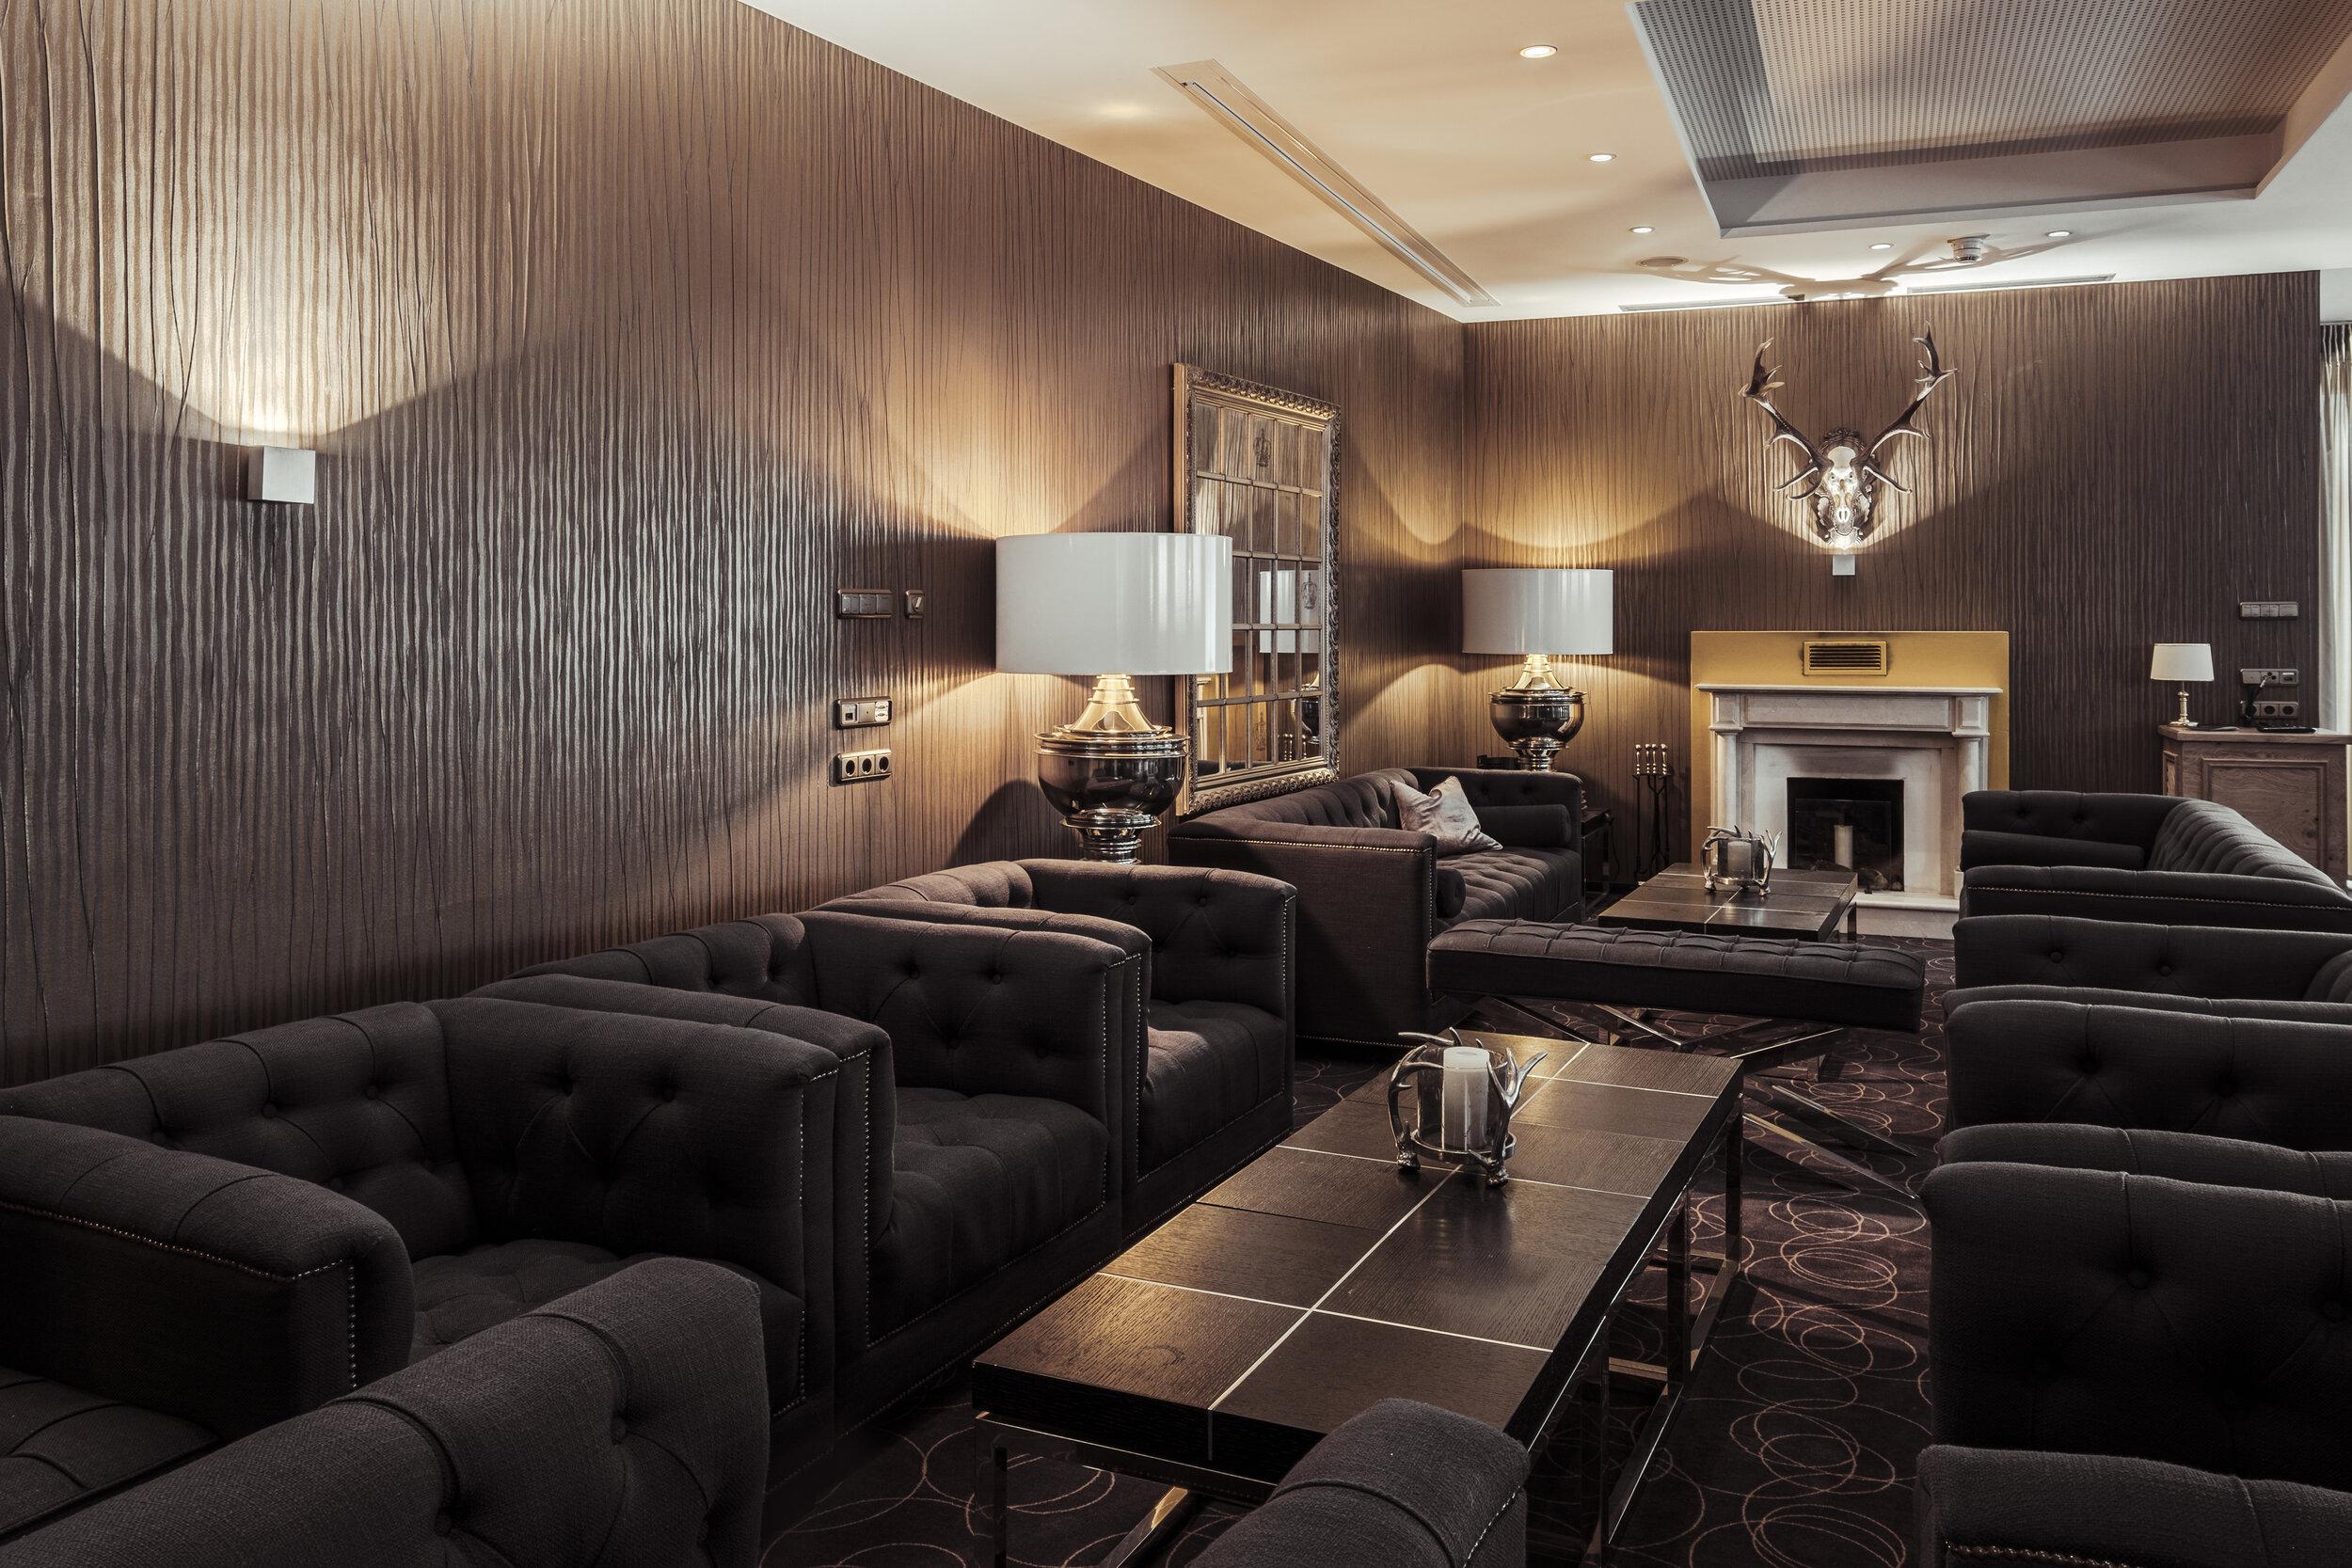 Hotel Oswald 4*S_2019_MTD_82-HDR.jpg